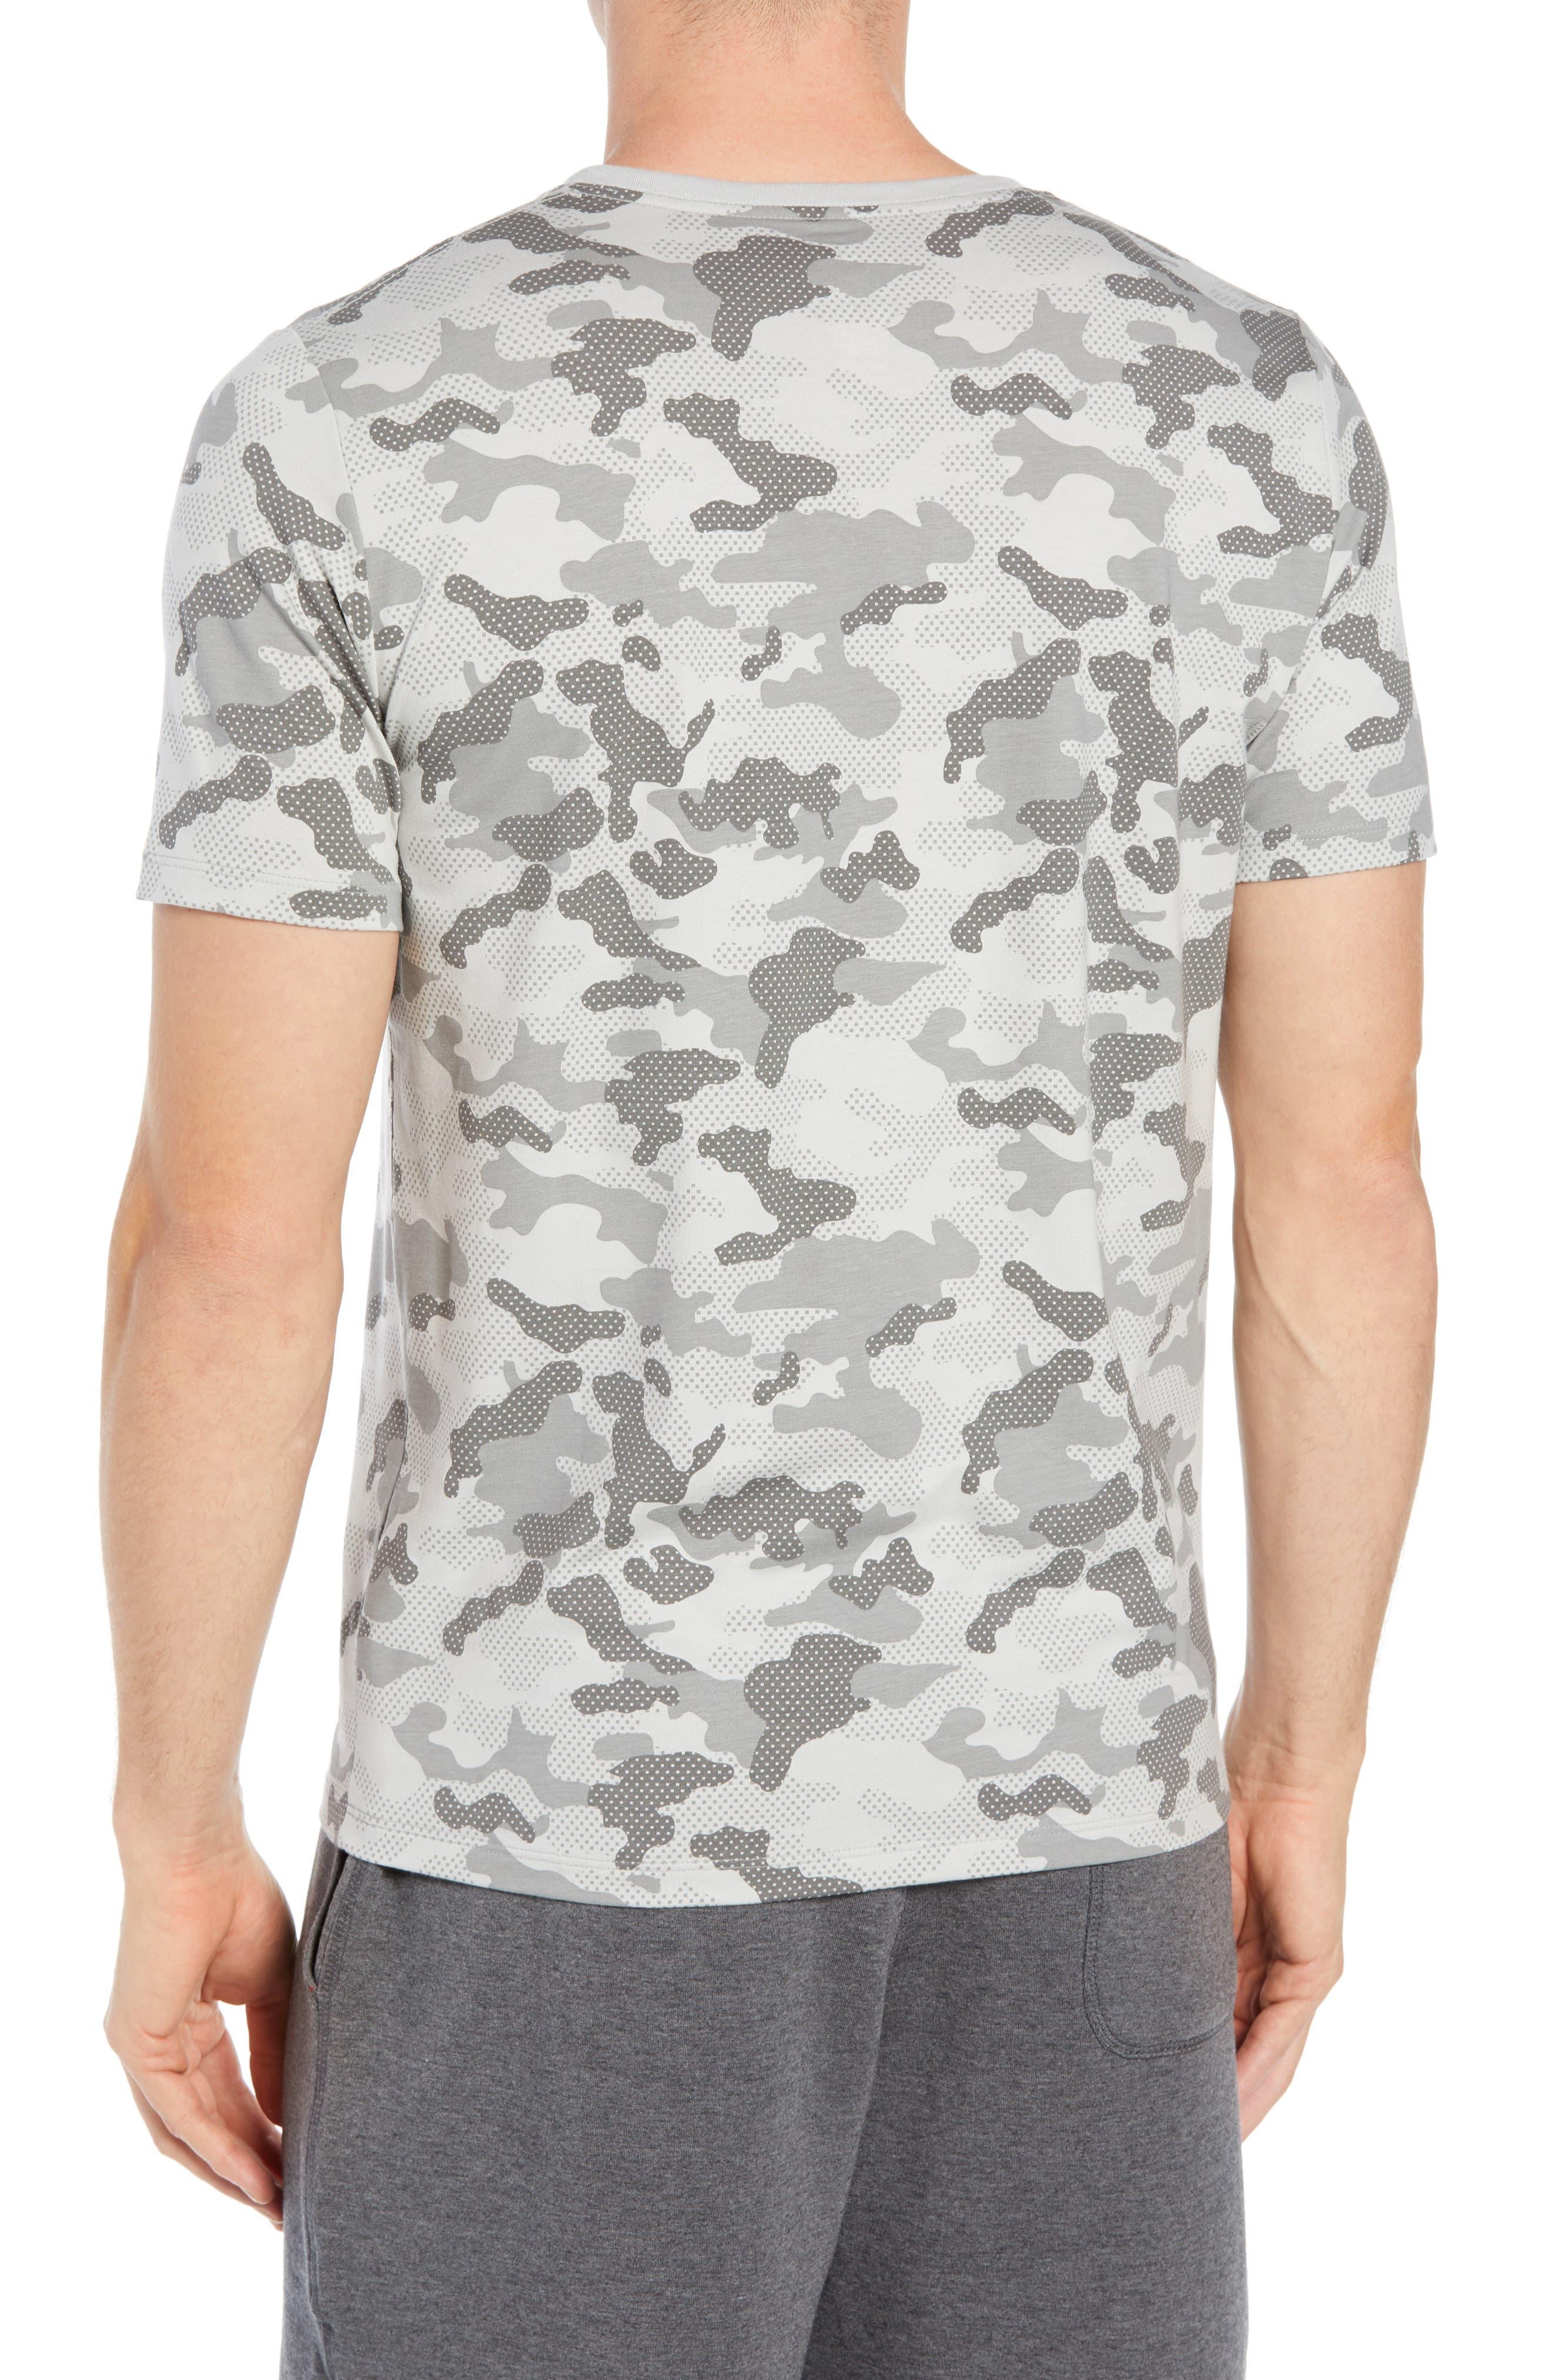 Second Skin Micromodal Deep V-Neck Undershirt,                             Alternate thumbnail 2, color,                             GREY CAMO